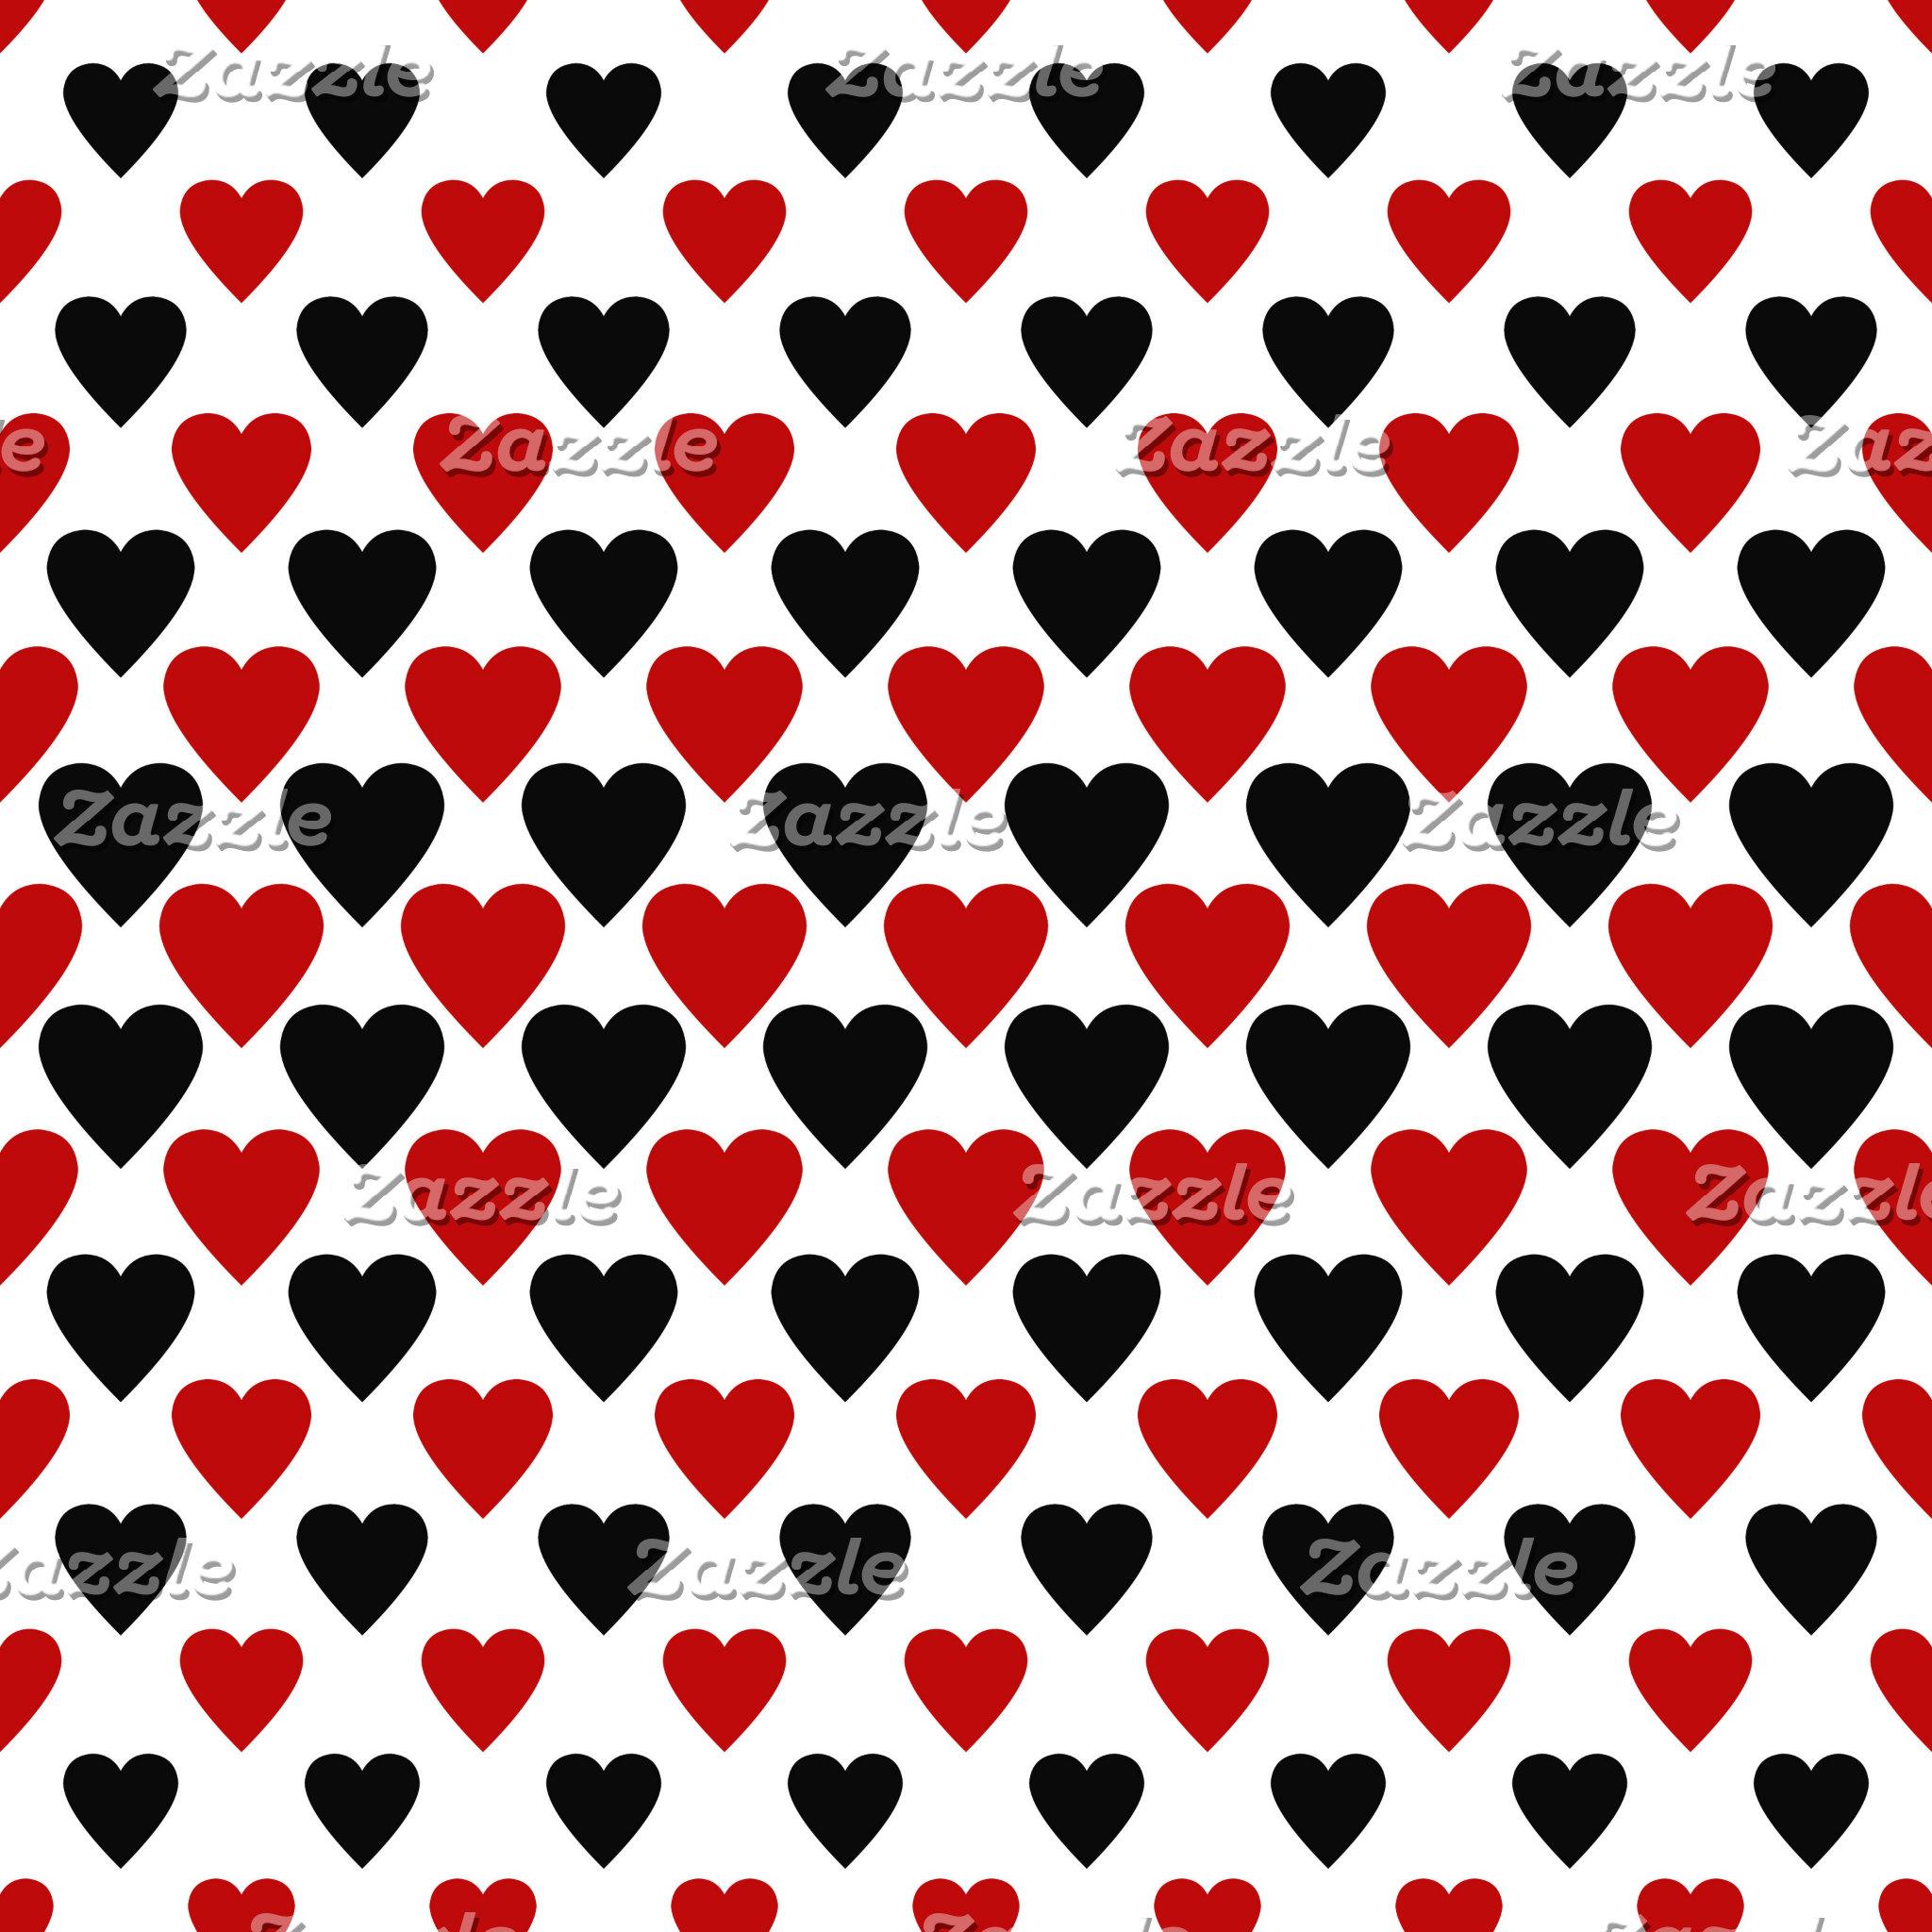 Heart Patterns